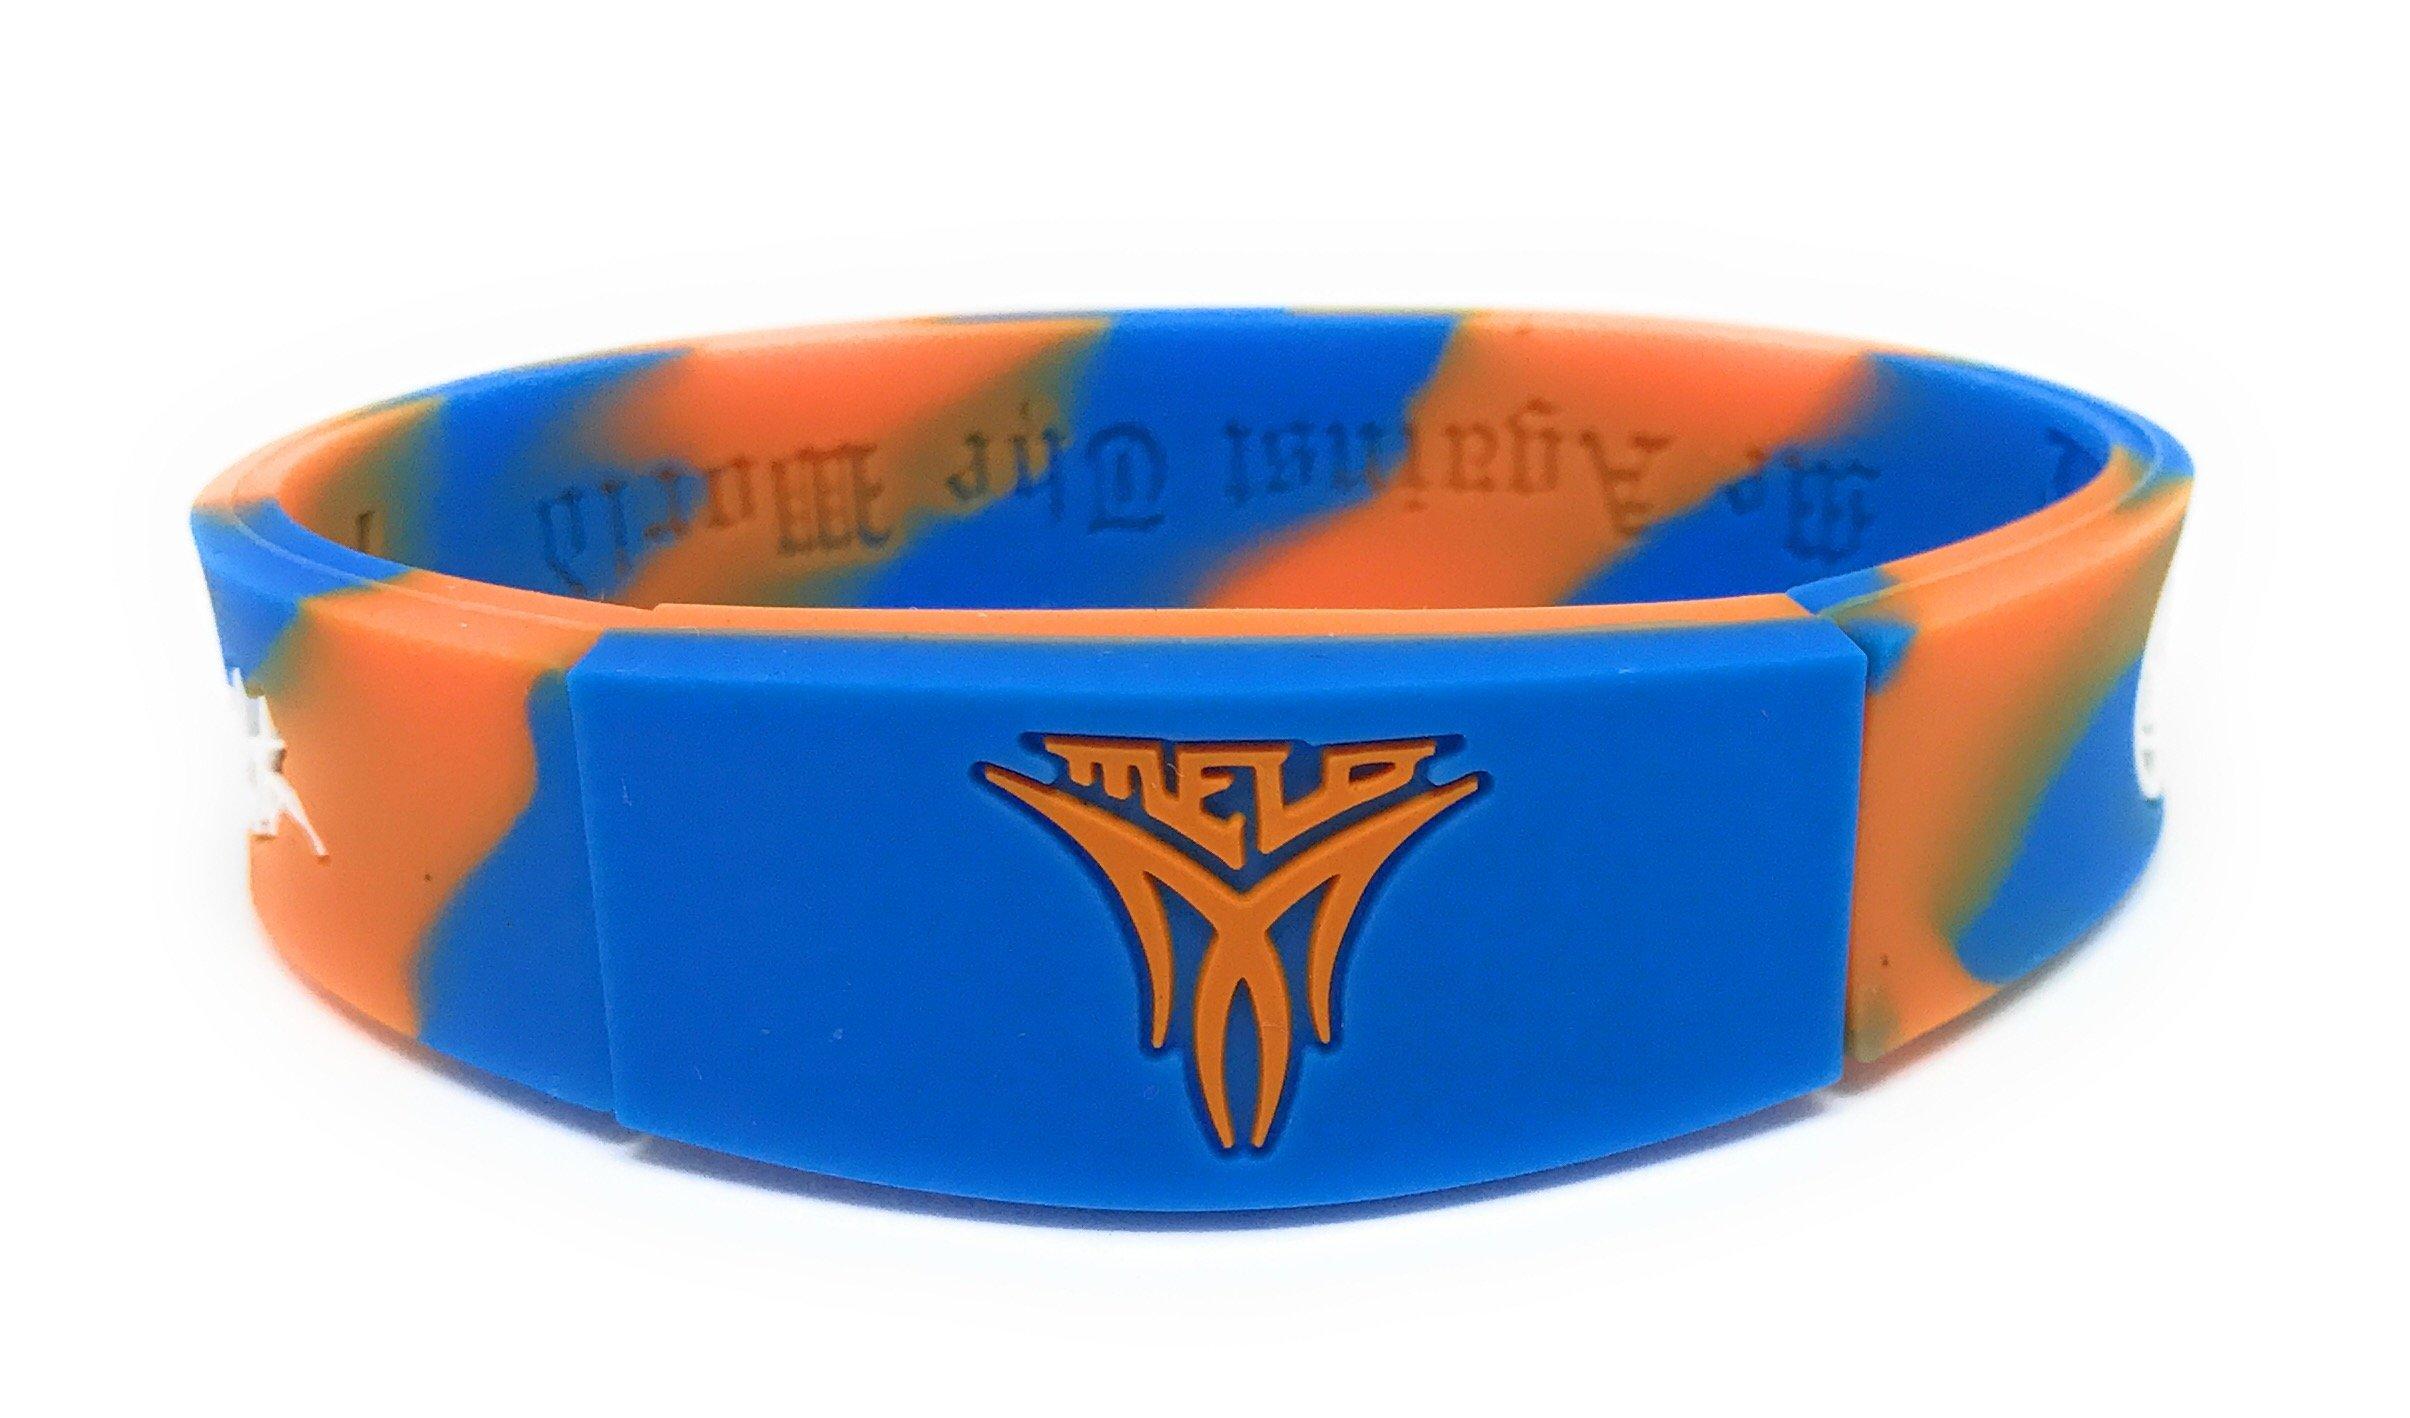 SportsBraceletsPro Reversible Wristband Adult/Teen 7.7'' Size Bracelets (Carmelo Camo)